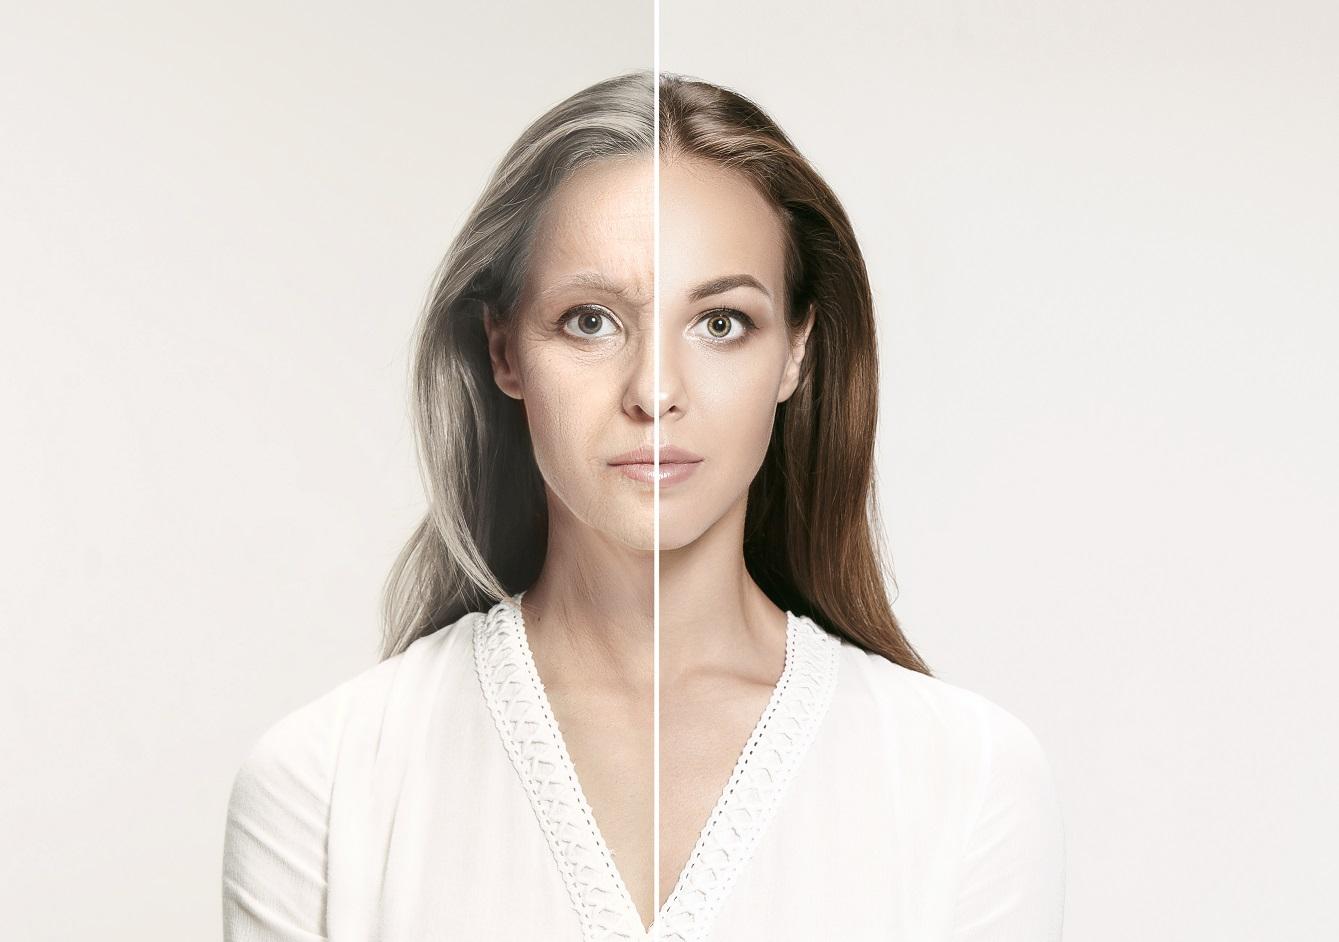 comparison-portrait-of-beautiful-woman-w